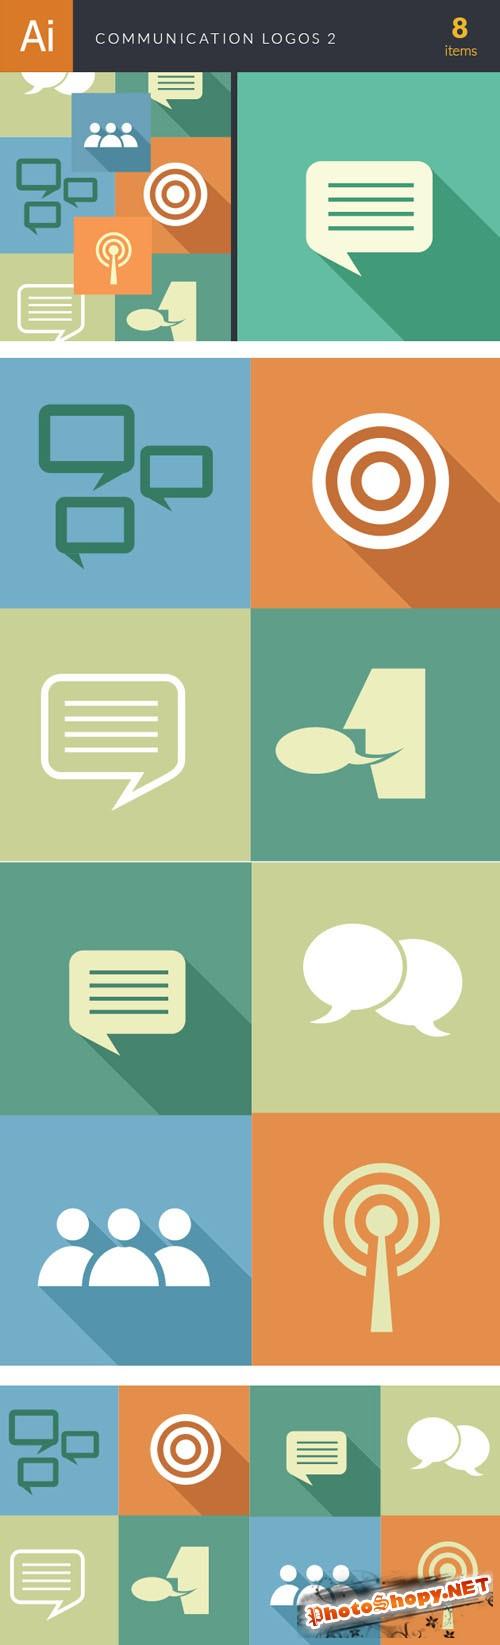 Communication Logos Vector Illustrations Pack 2